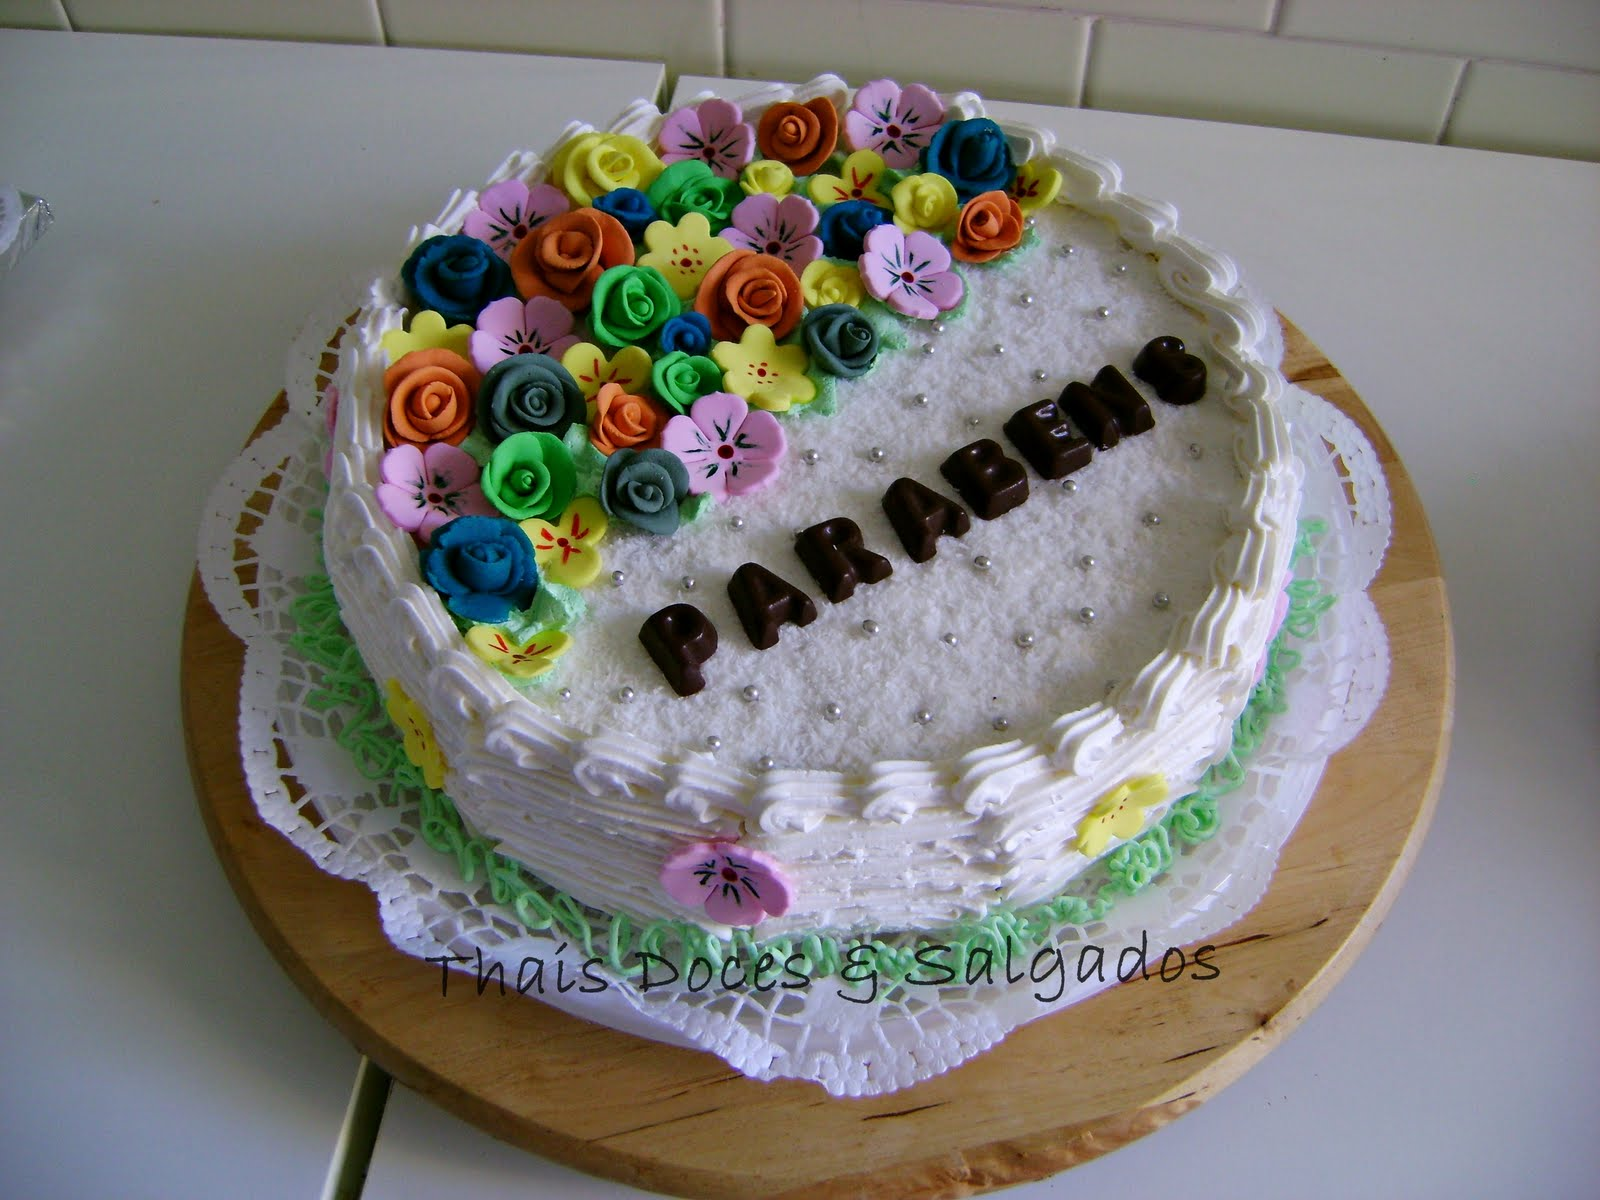 Festa de aniversário de 15 anos, a festa de debutante